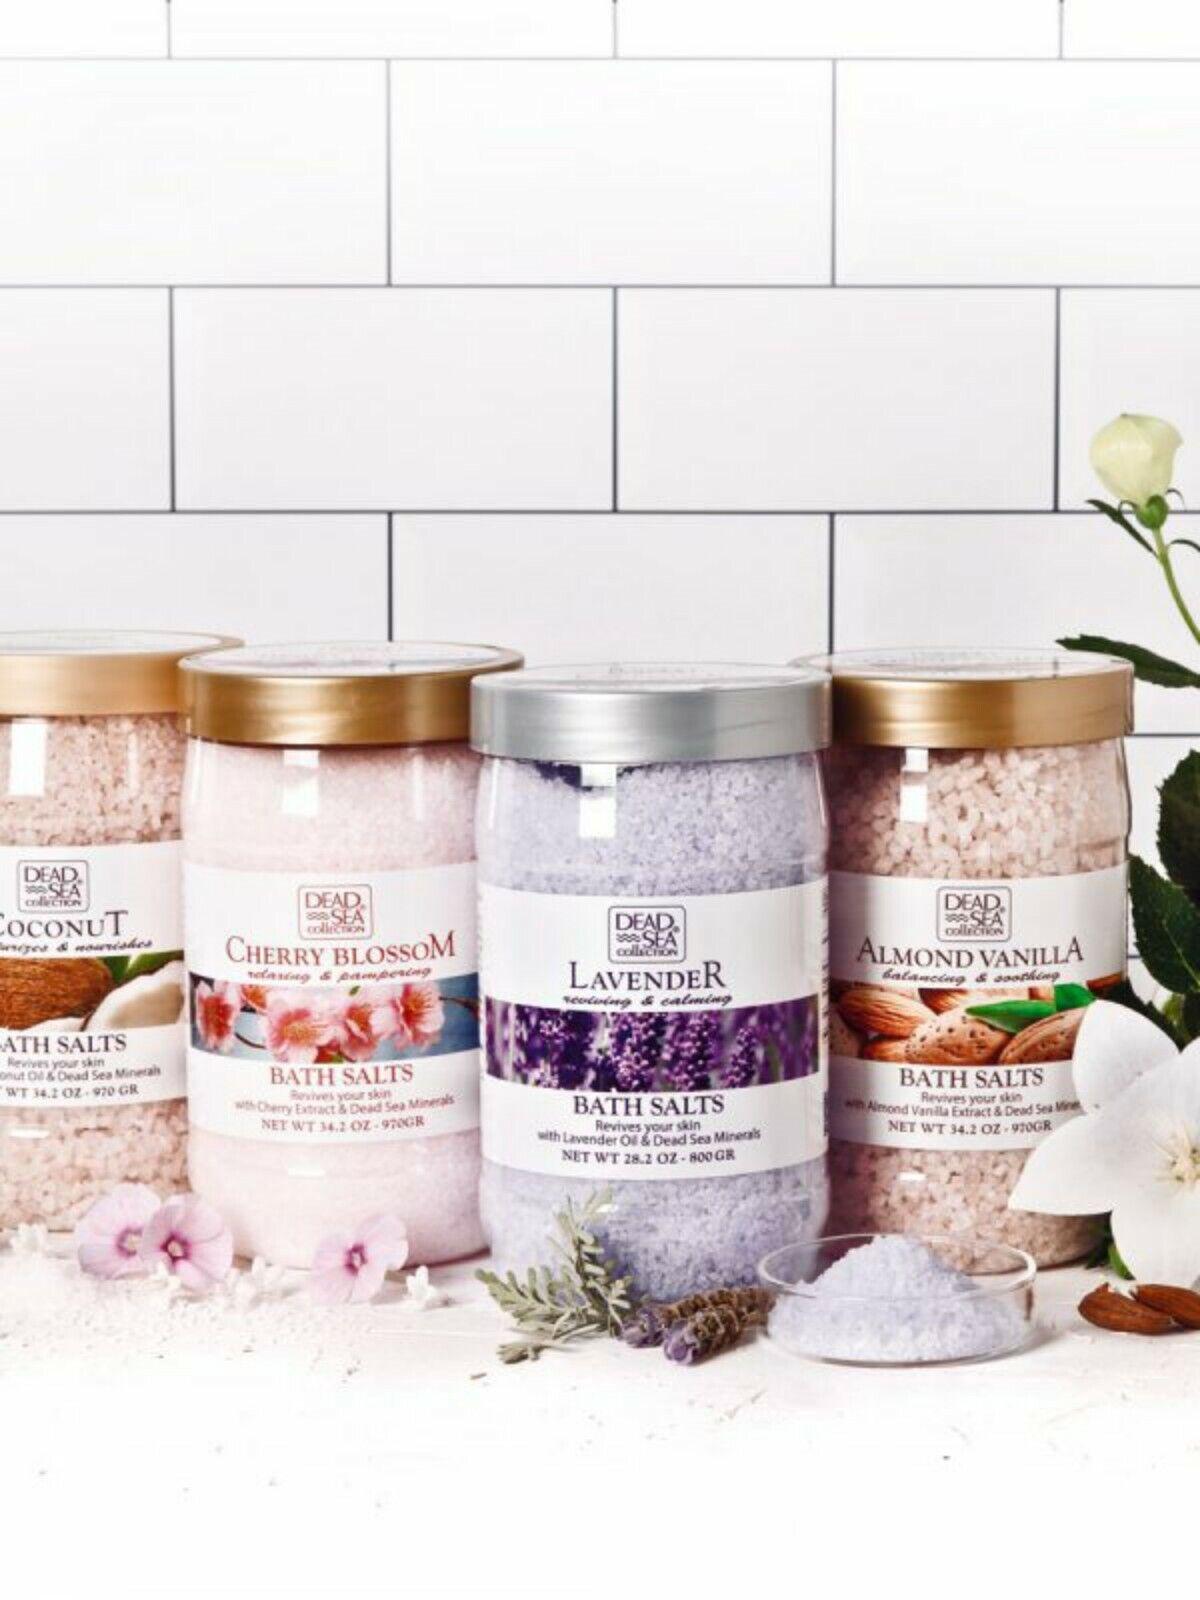 Dead Sea Collection Bath Salts  28.2 oz